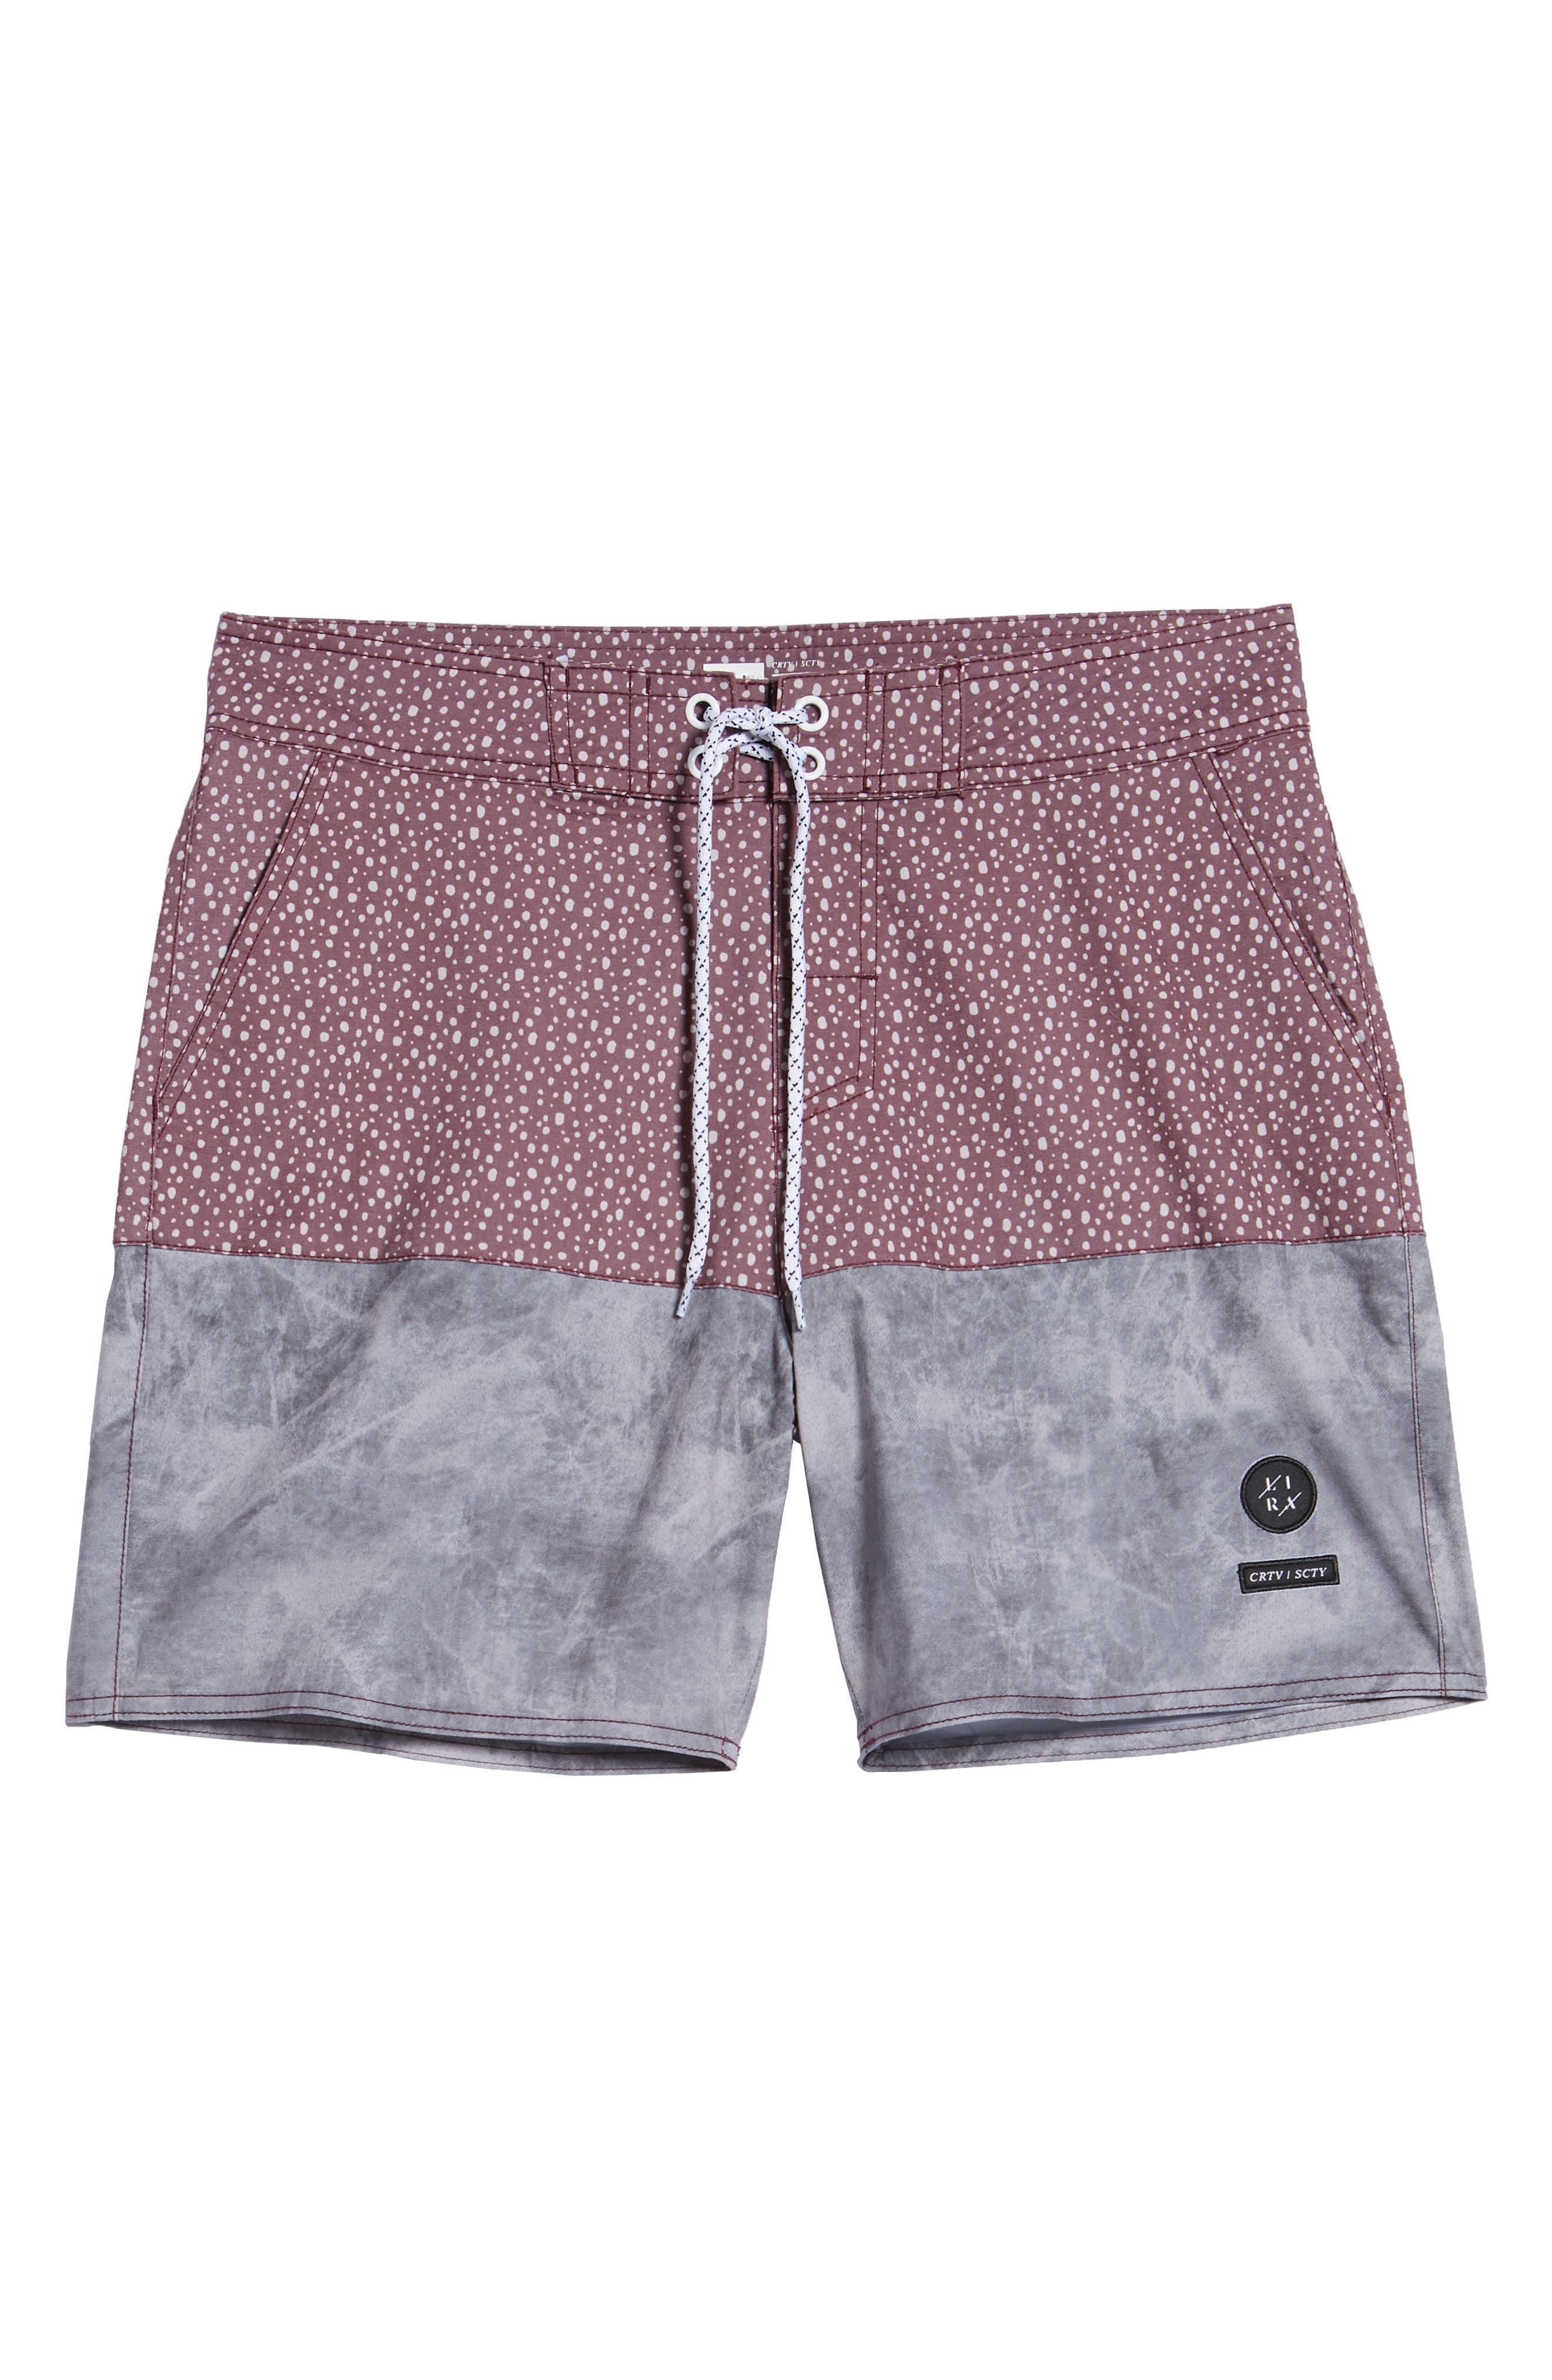 Dotted Swim Shorts,                             Alternate thumbnail 6, color,                             Rust